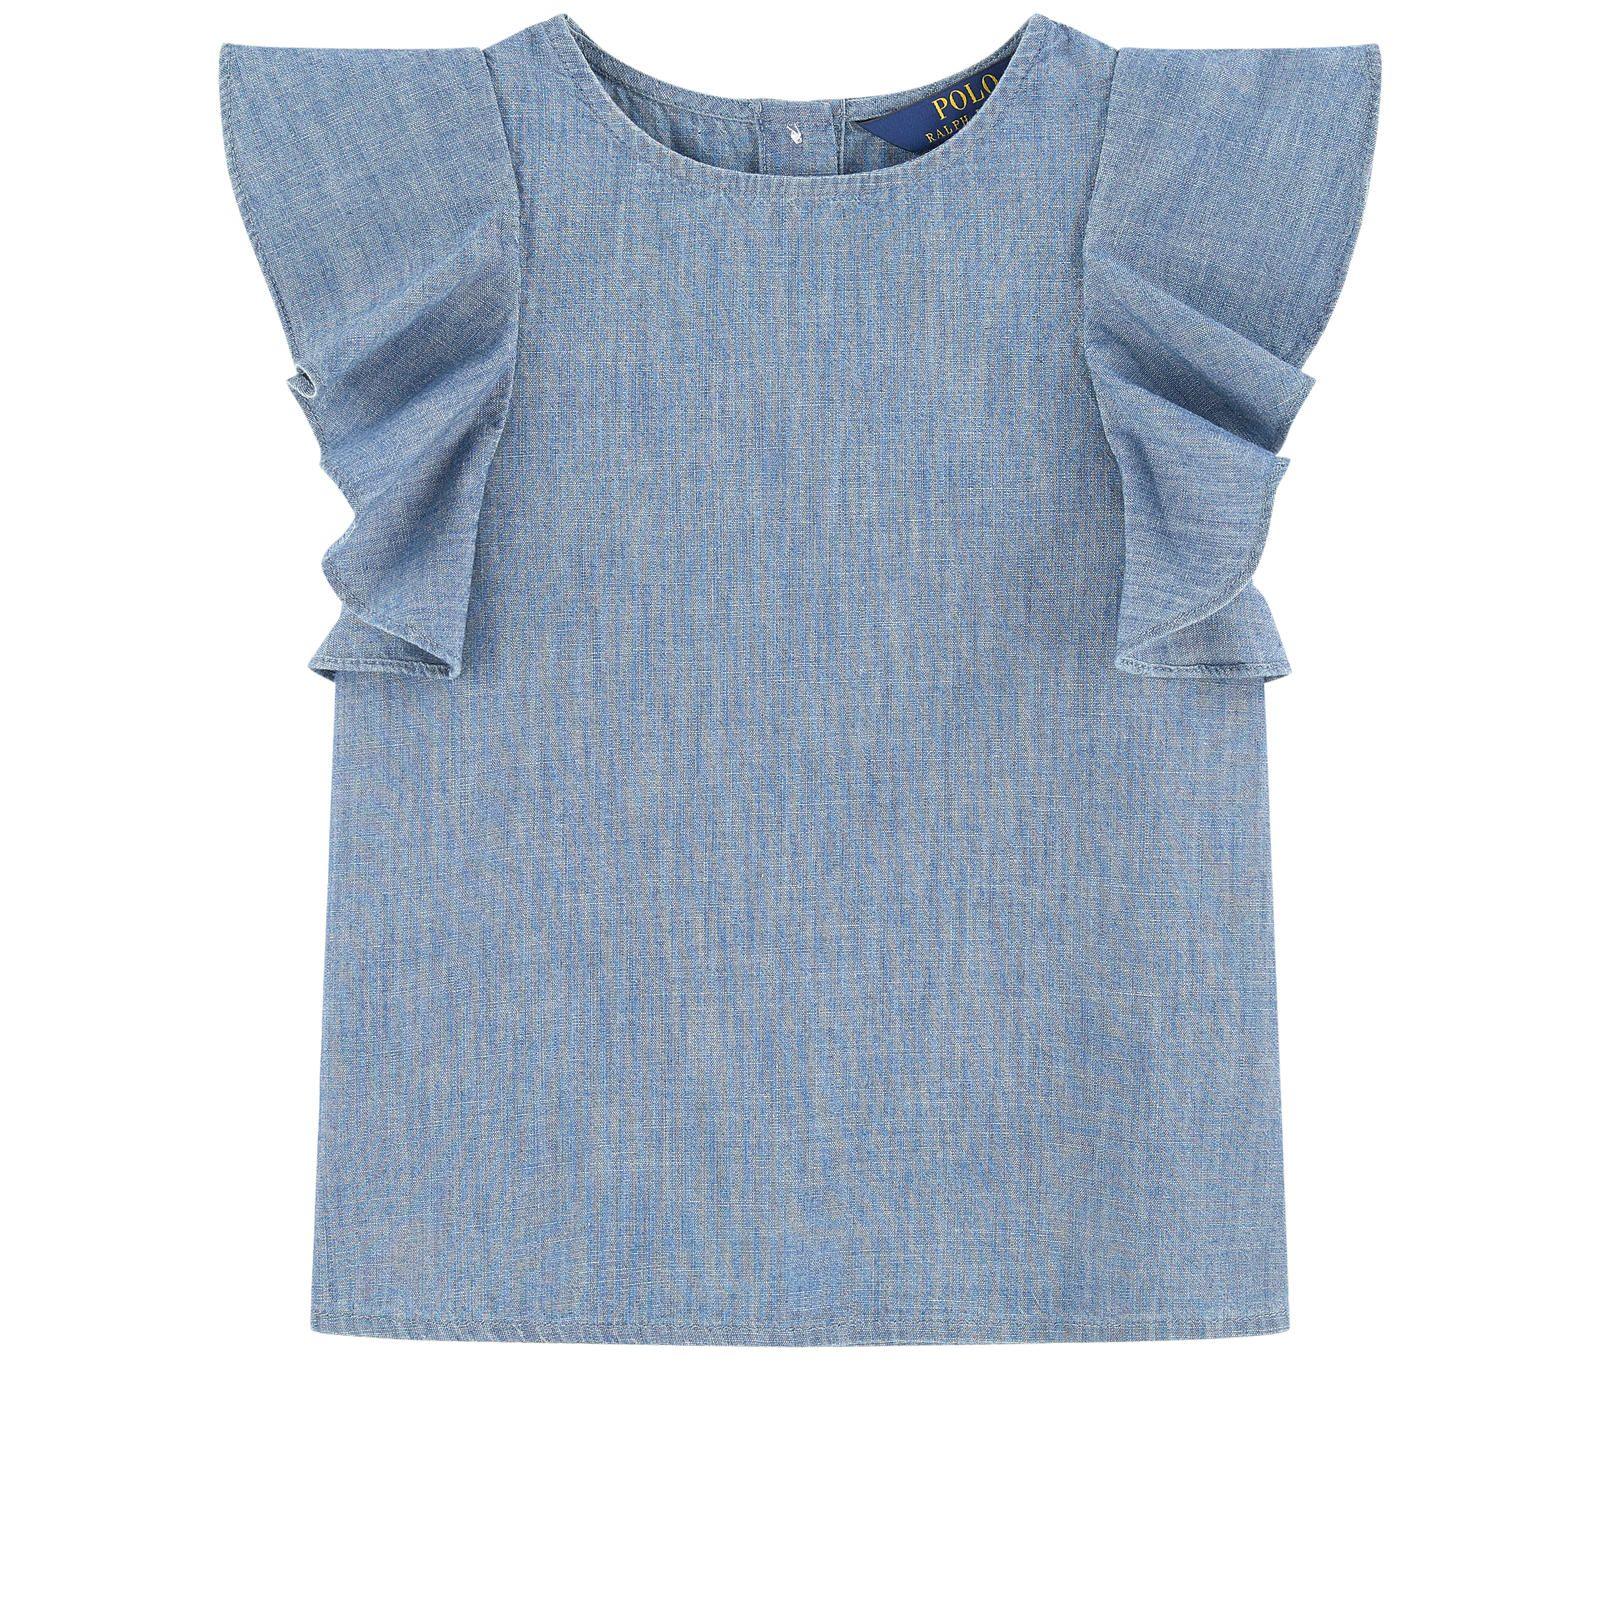 blouse-chambray-ralphlauren-melijoe